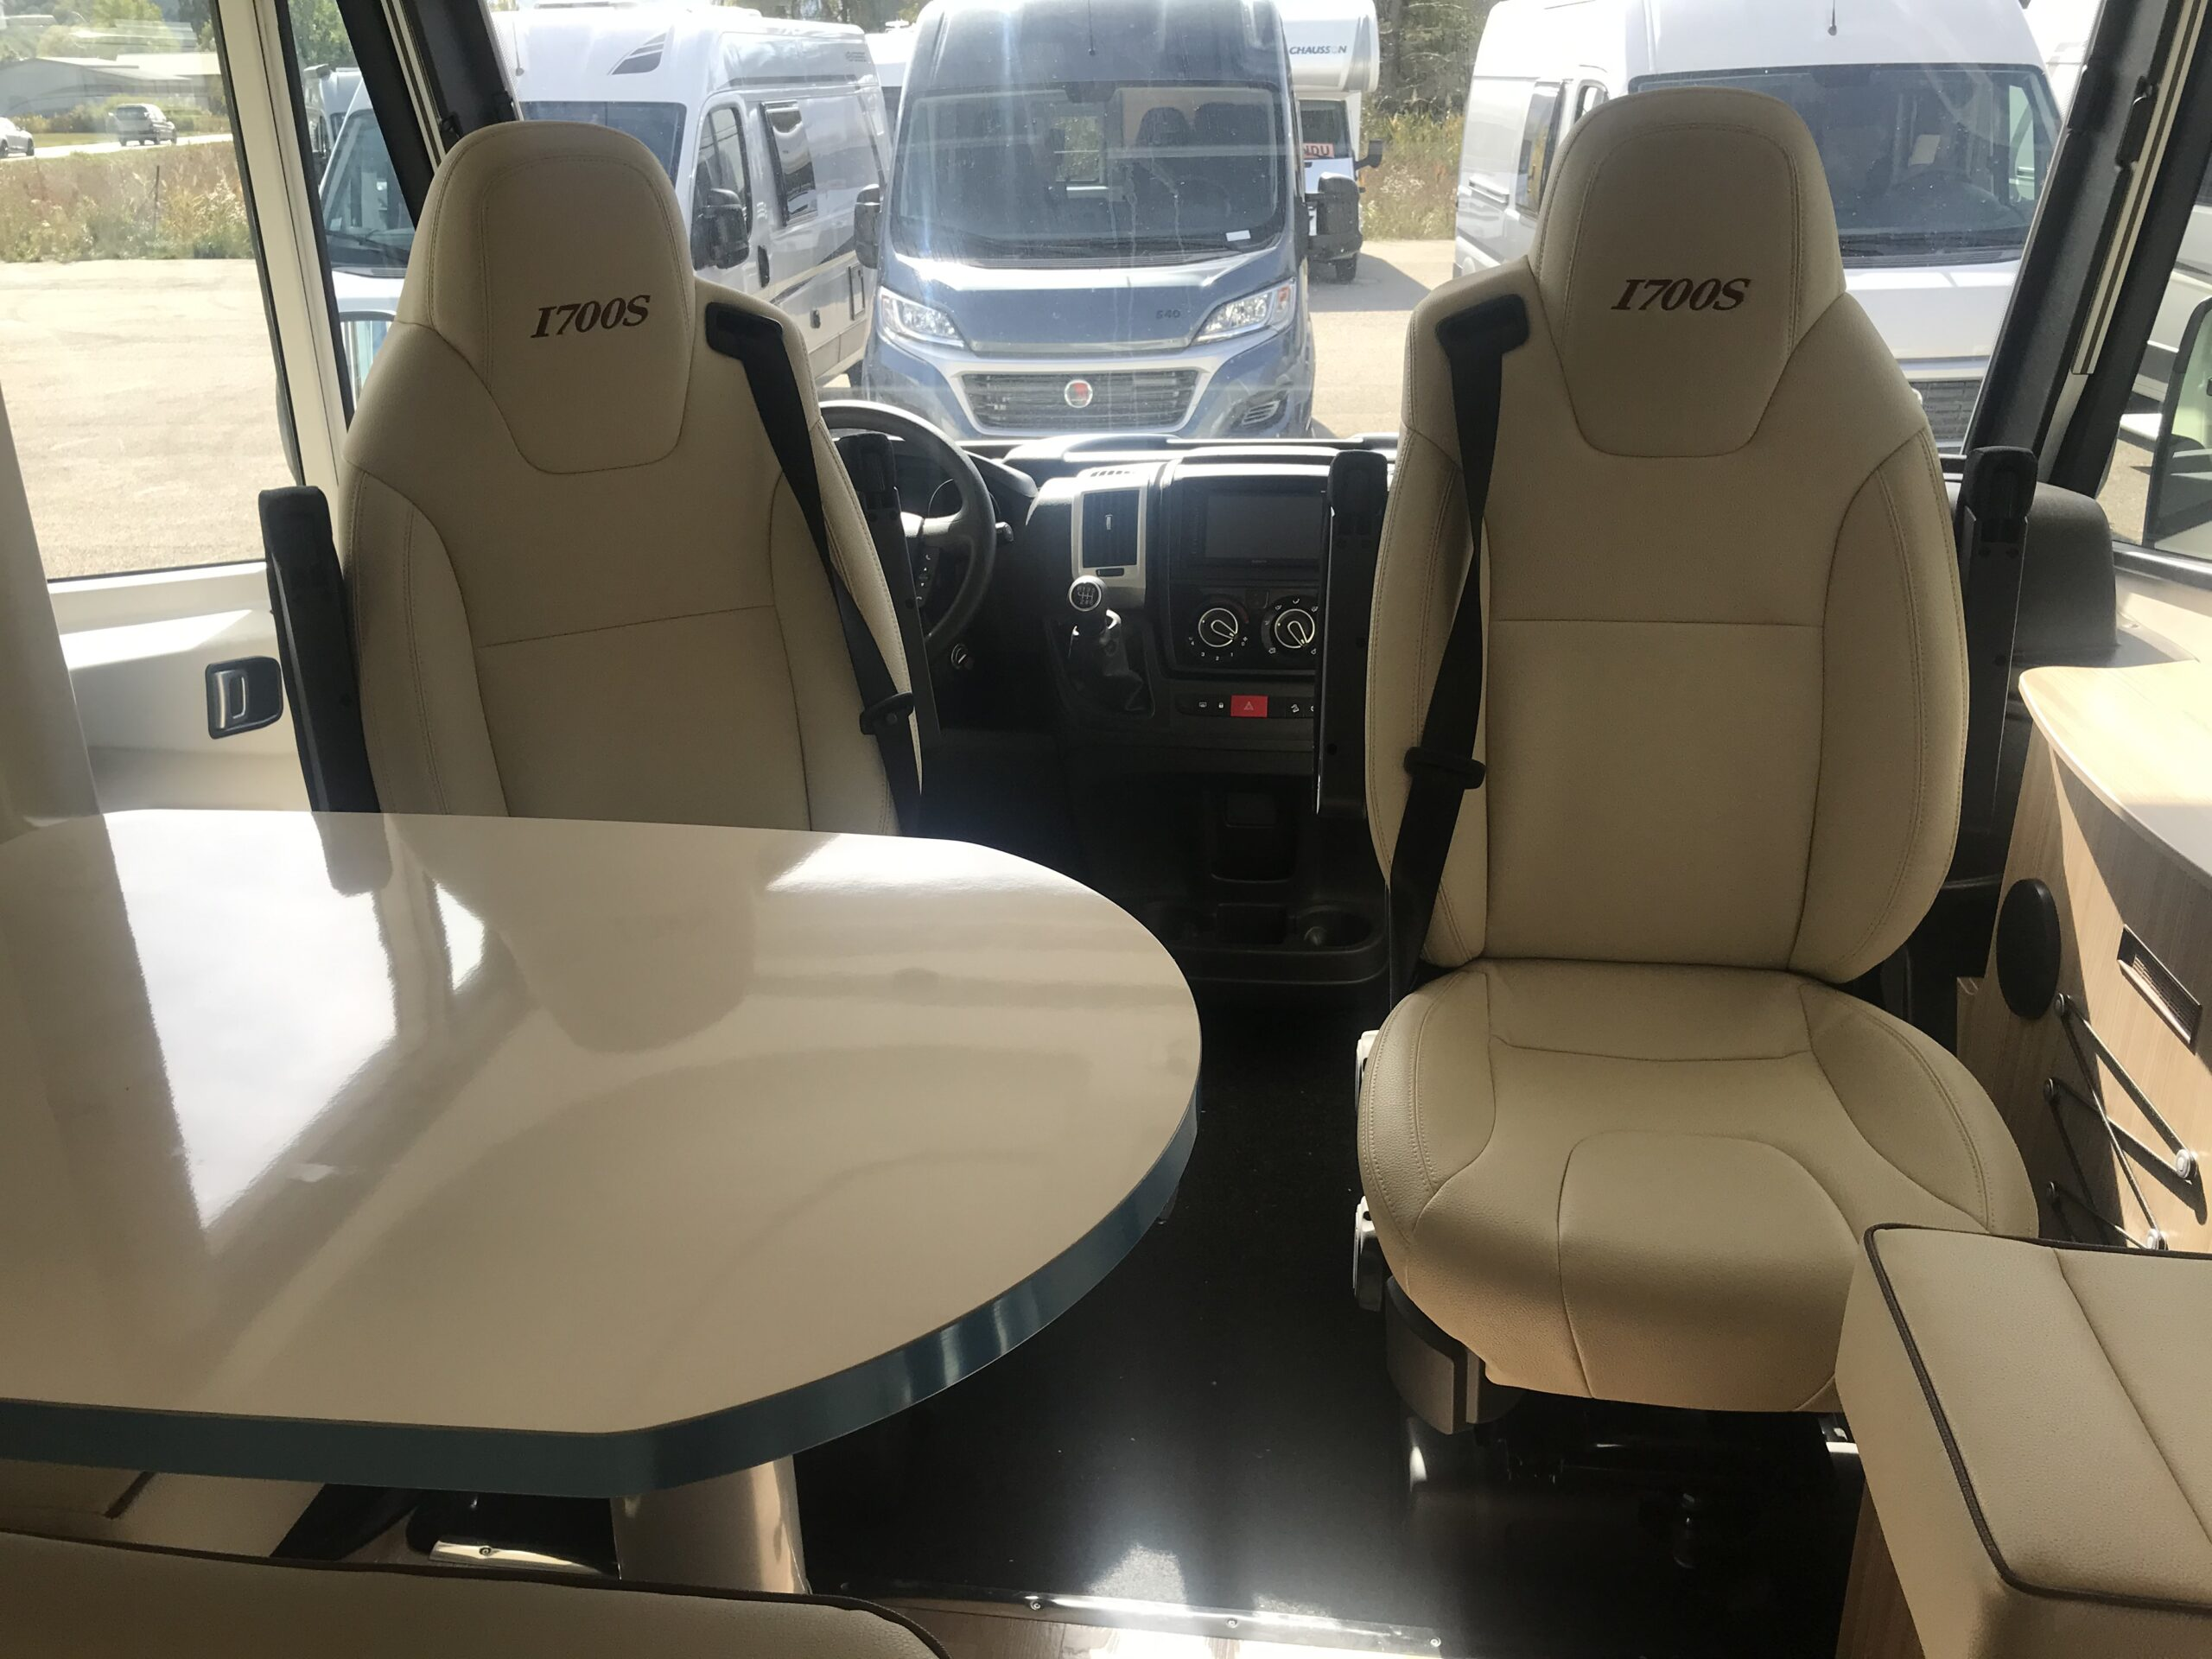 AUTOSTAR I700S – DERNIER VEHICULE